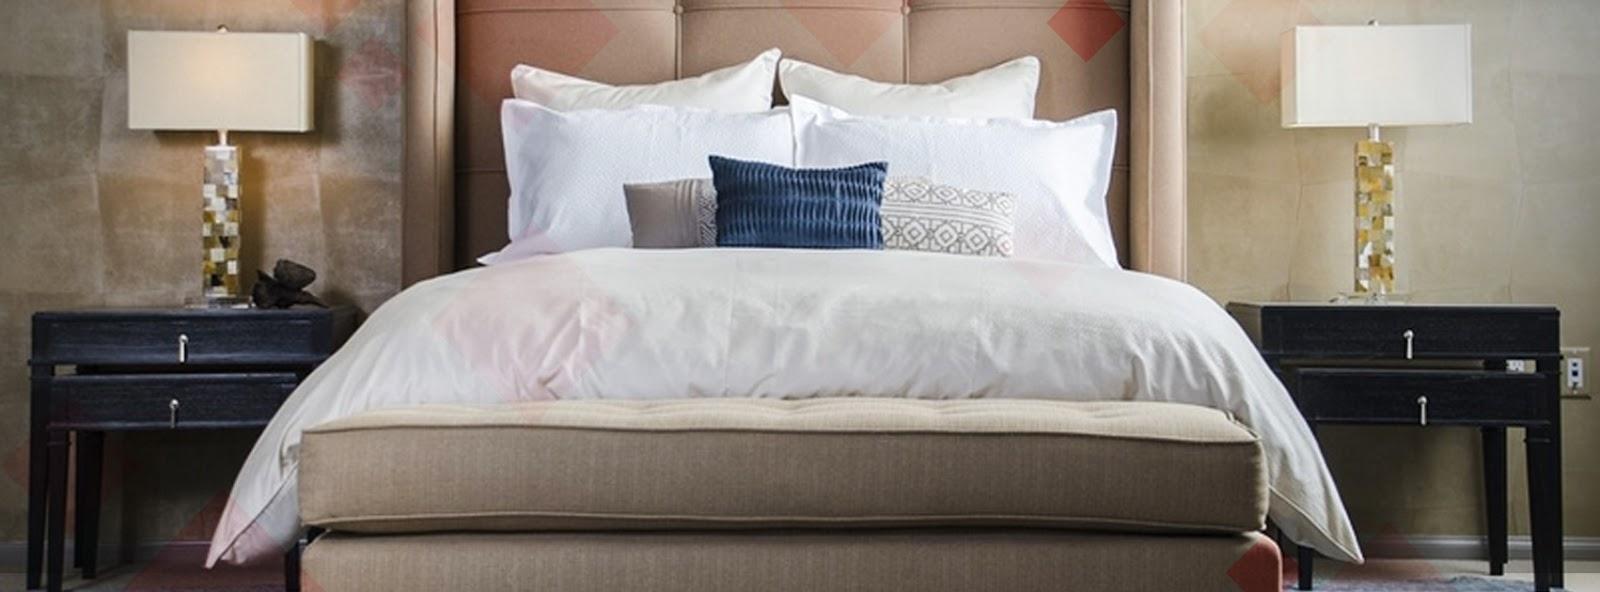 Best Bedding Sets In Usa